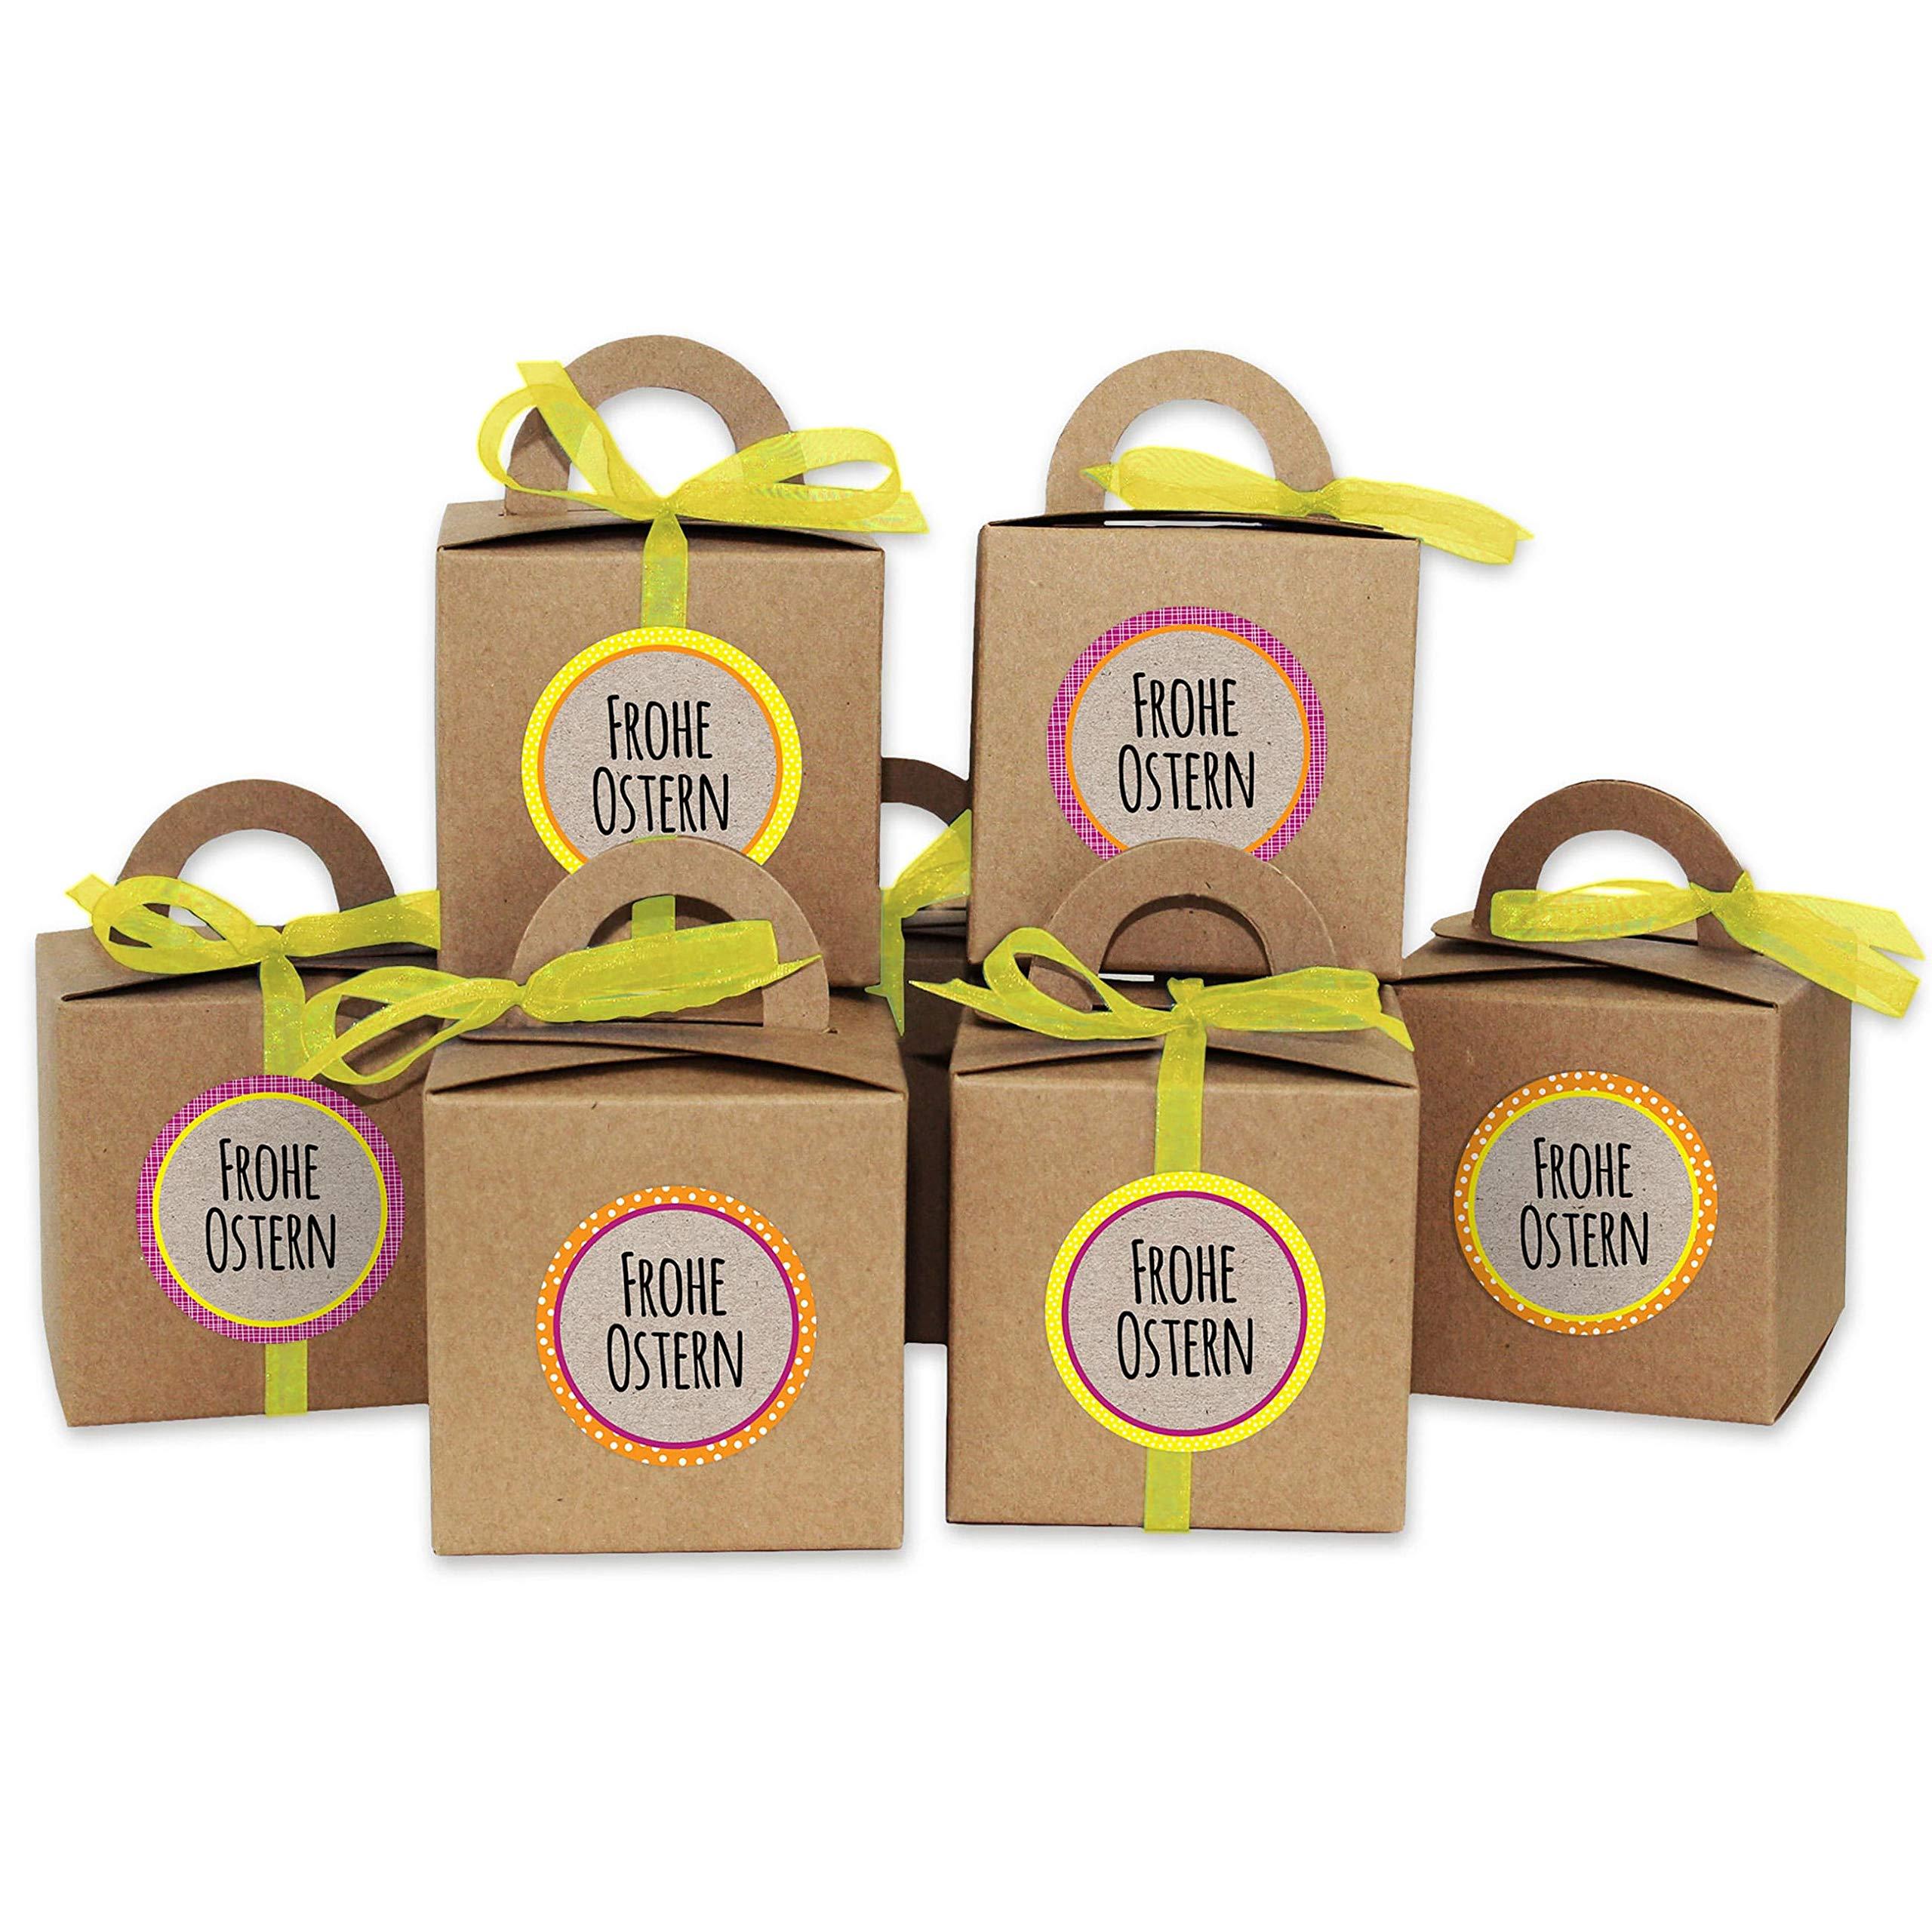 Papierdrachen Cajitas de conejitos de Pascua DIY Cajitas de Regalo en marrón para Pascua - Envoltorio Elegante de Regalo - Diseño 2: Amazon.es: Hogar